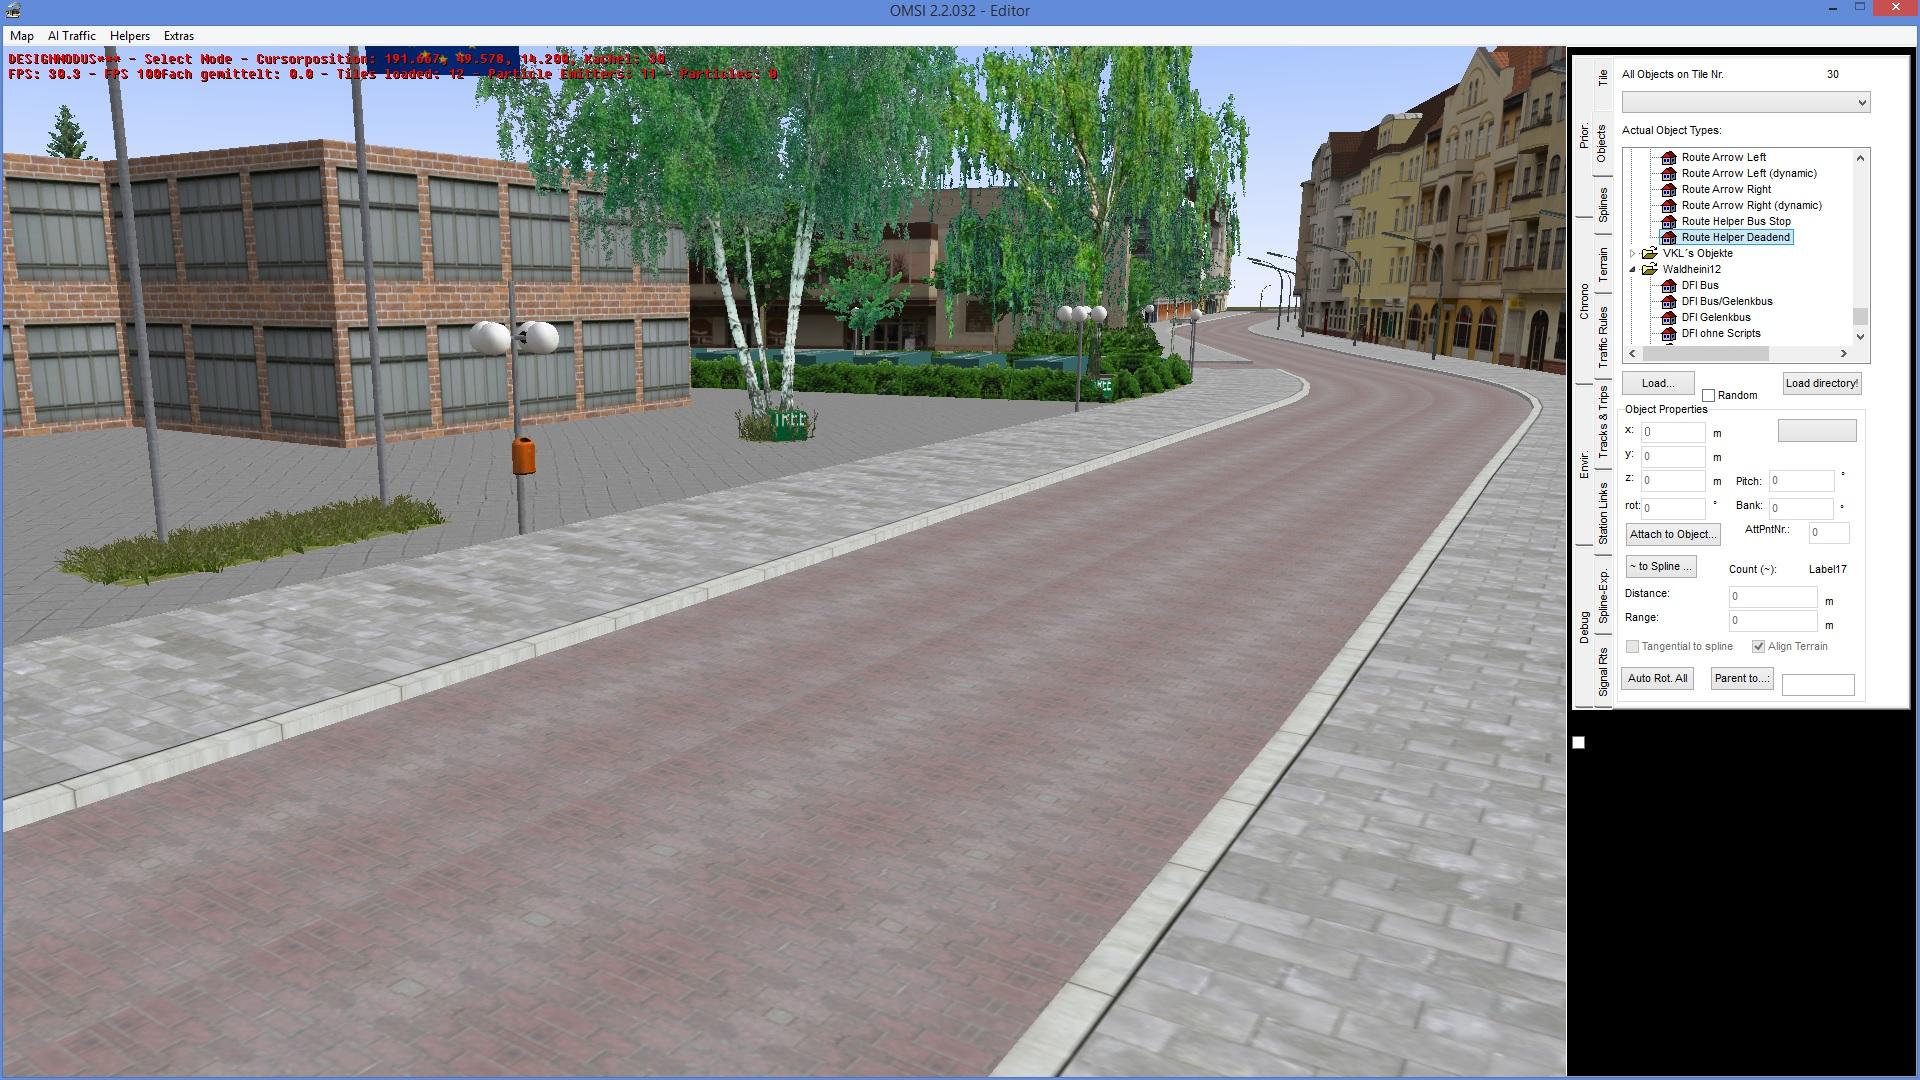 map_300416_5.jpg